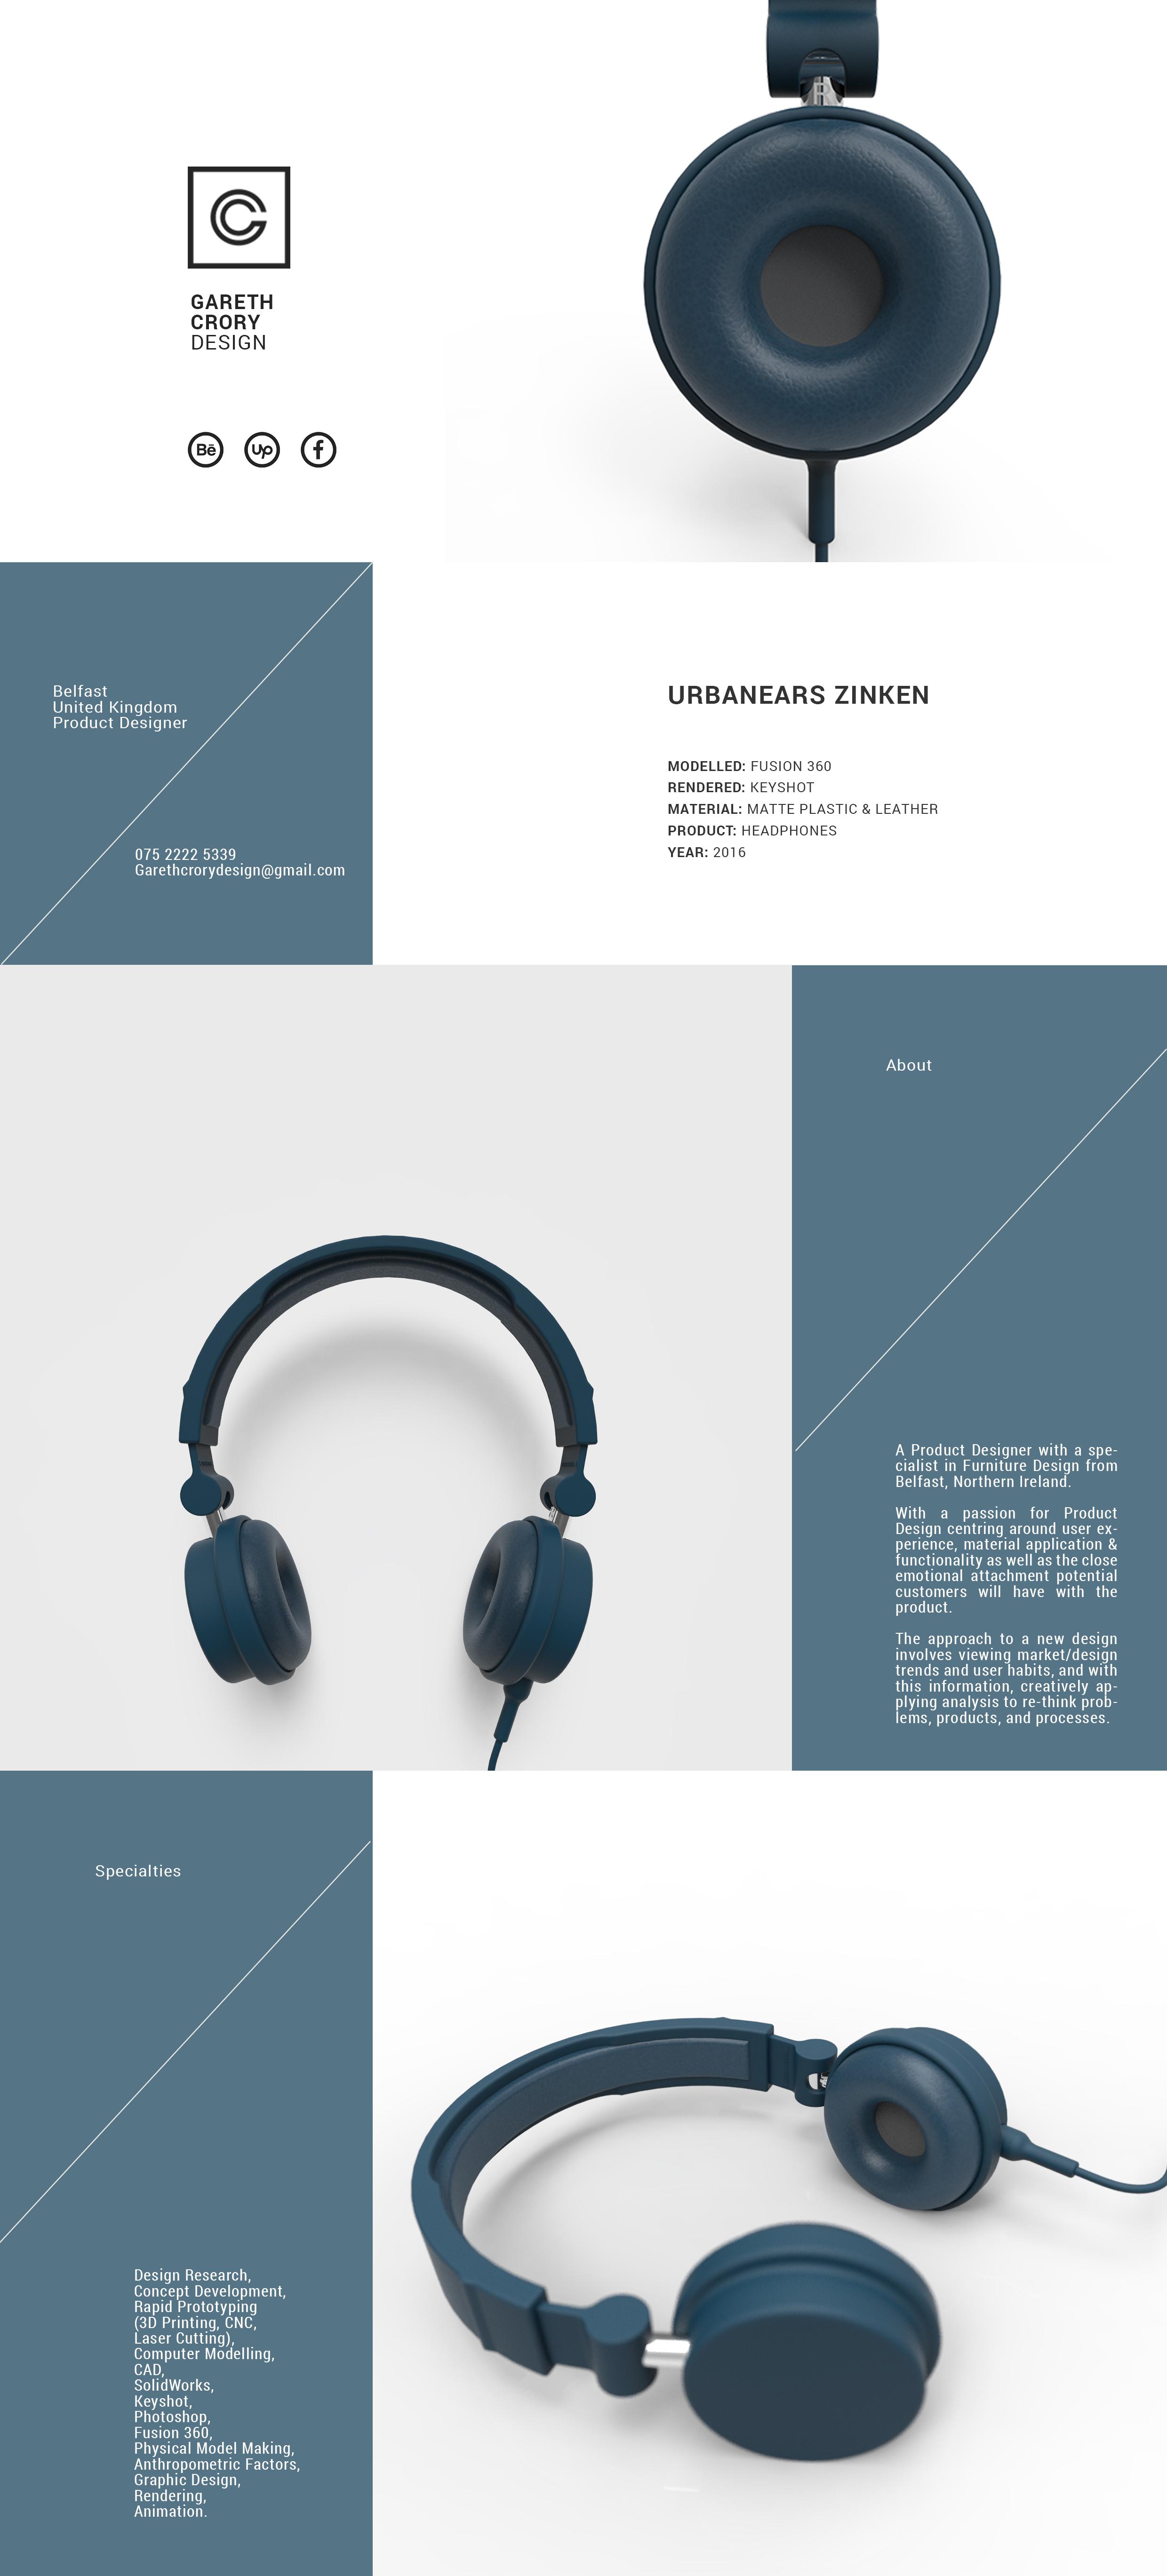 Urbanears    Zinken    3D Render by Gareth Crory - Design